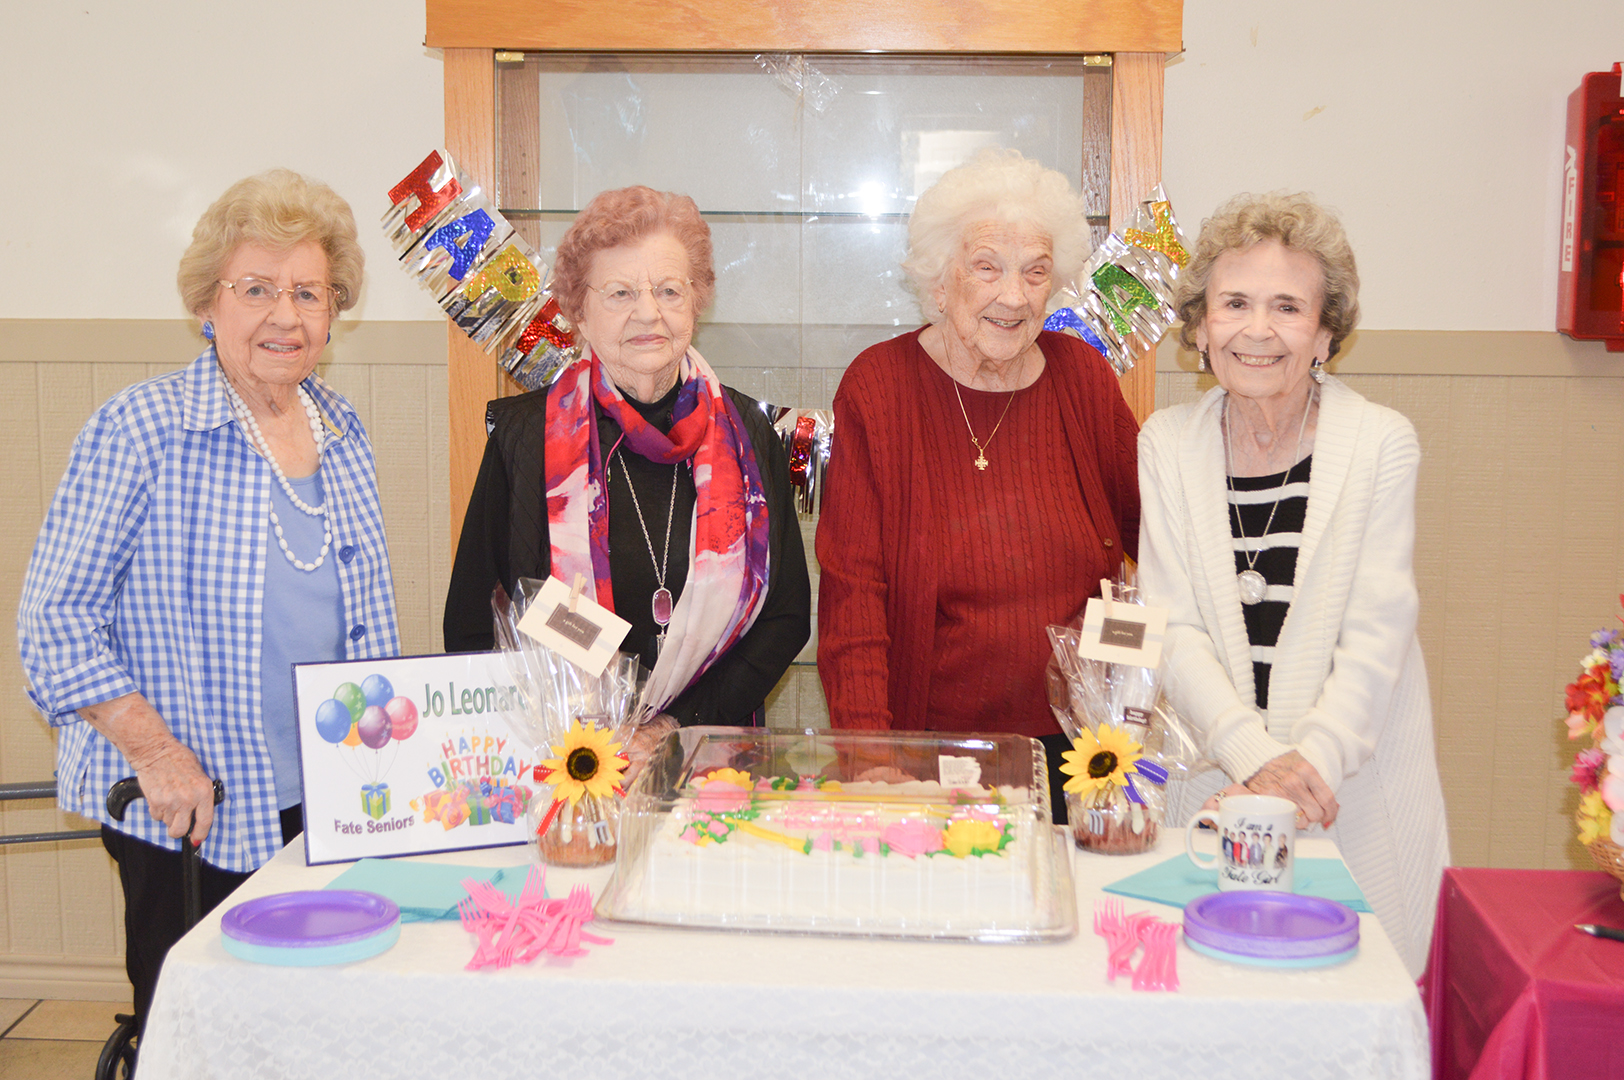 'Fate Girls' Member Celebrates 92nd Birthday